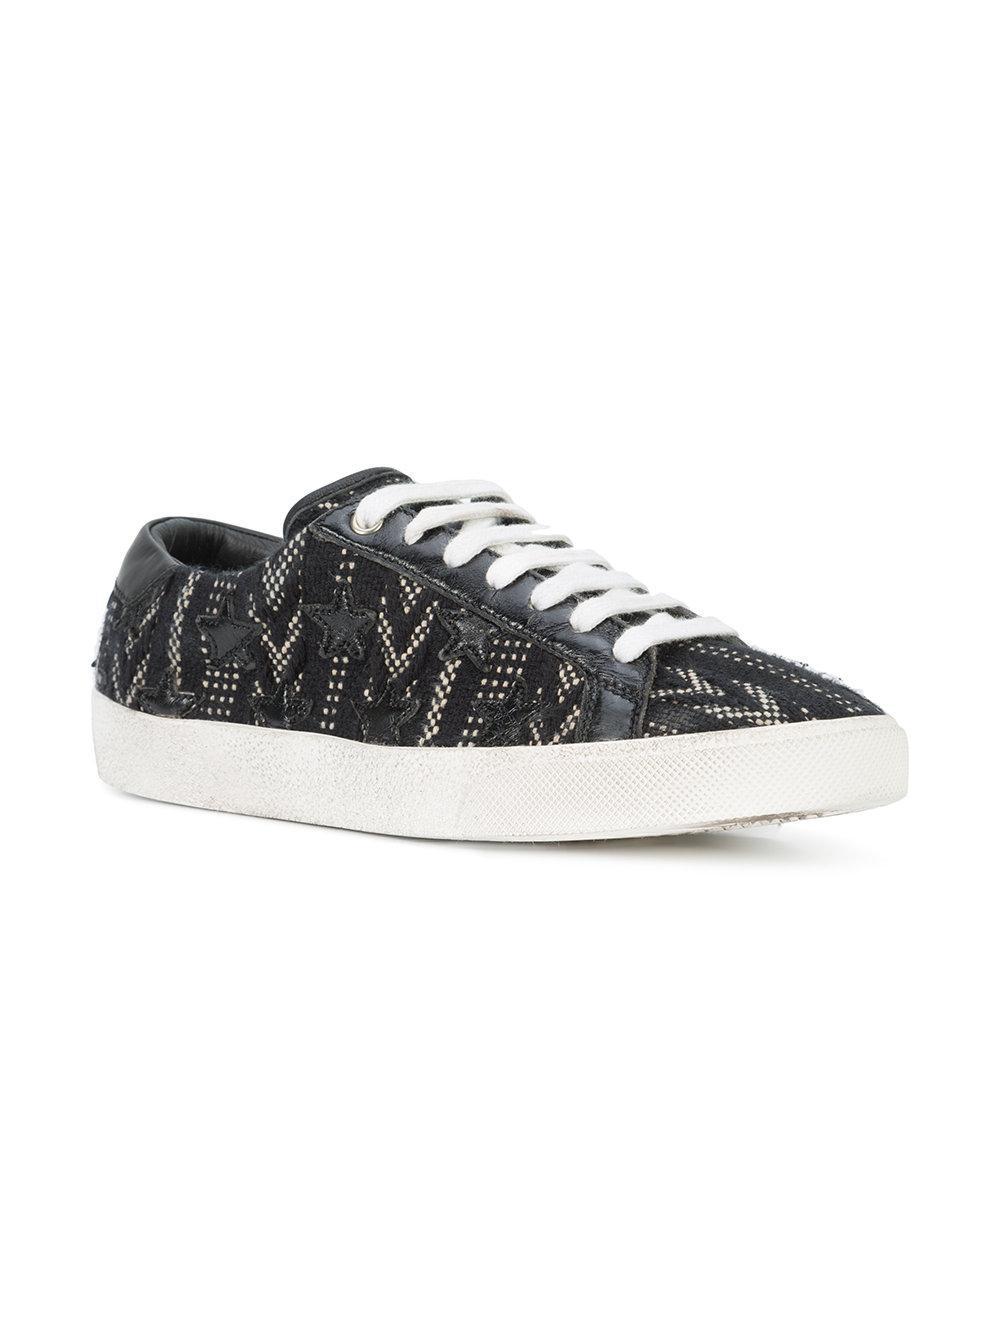 huge selection of 58958 7740a saint-laurent-Black-Berber-Signature-Court-Classic-Sneakers.jpeg